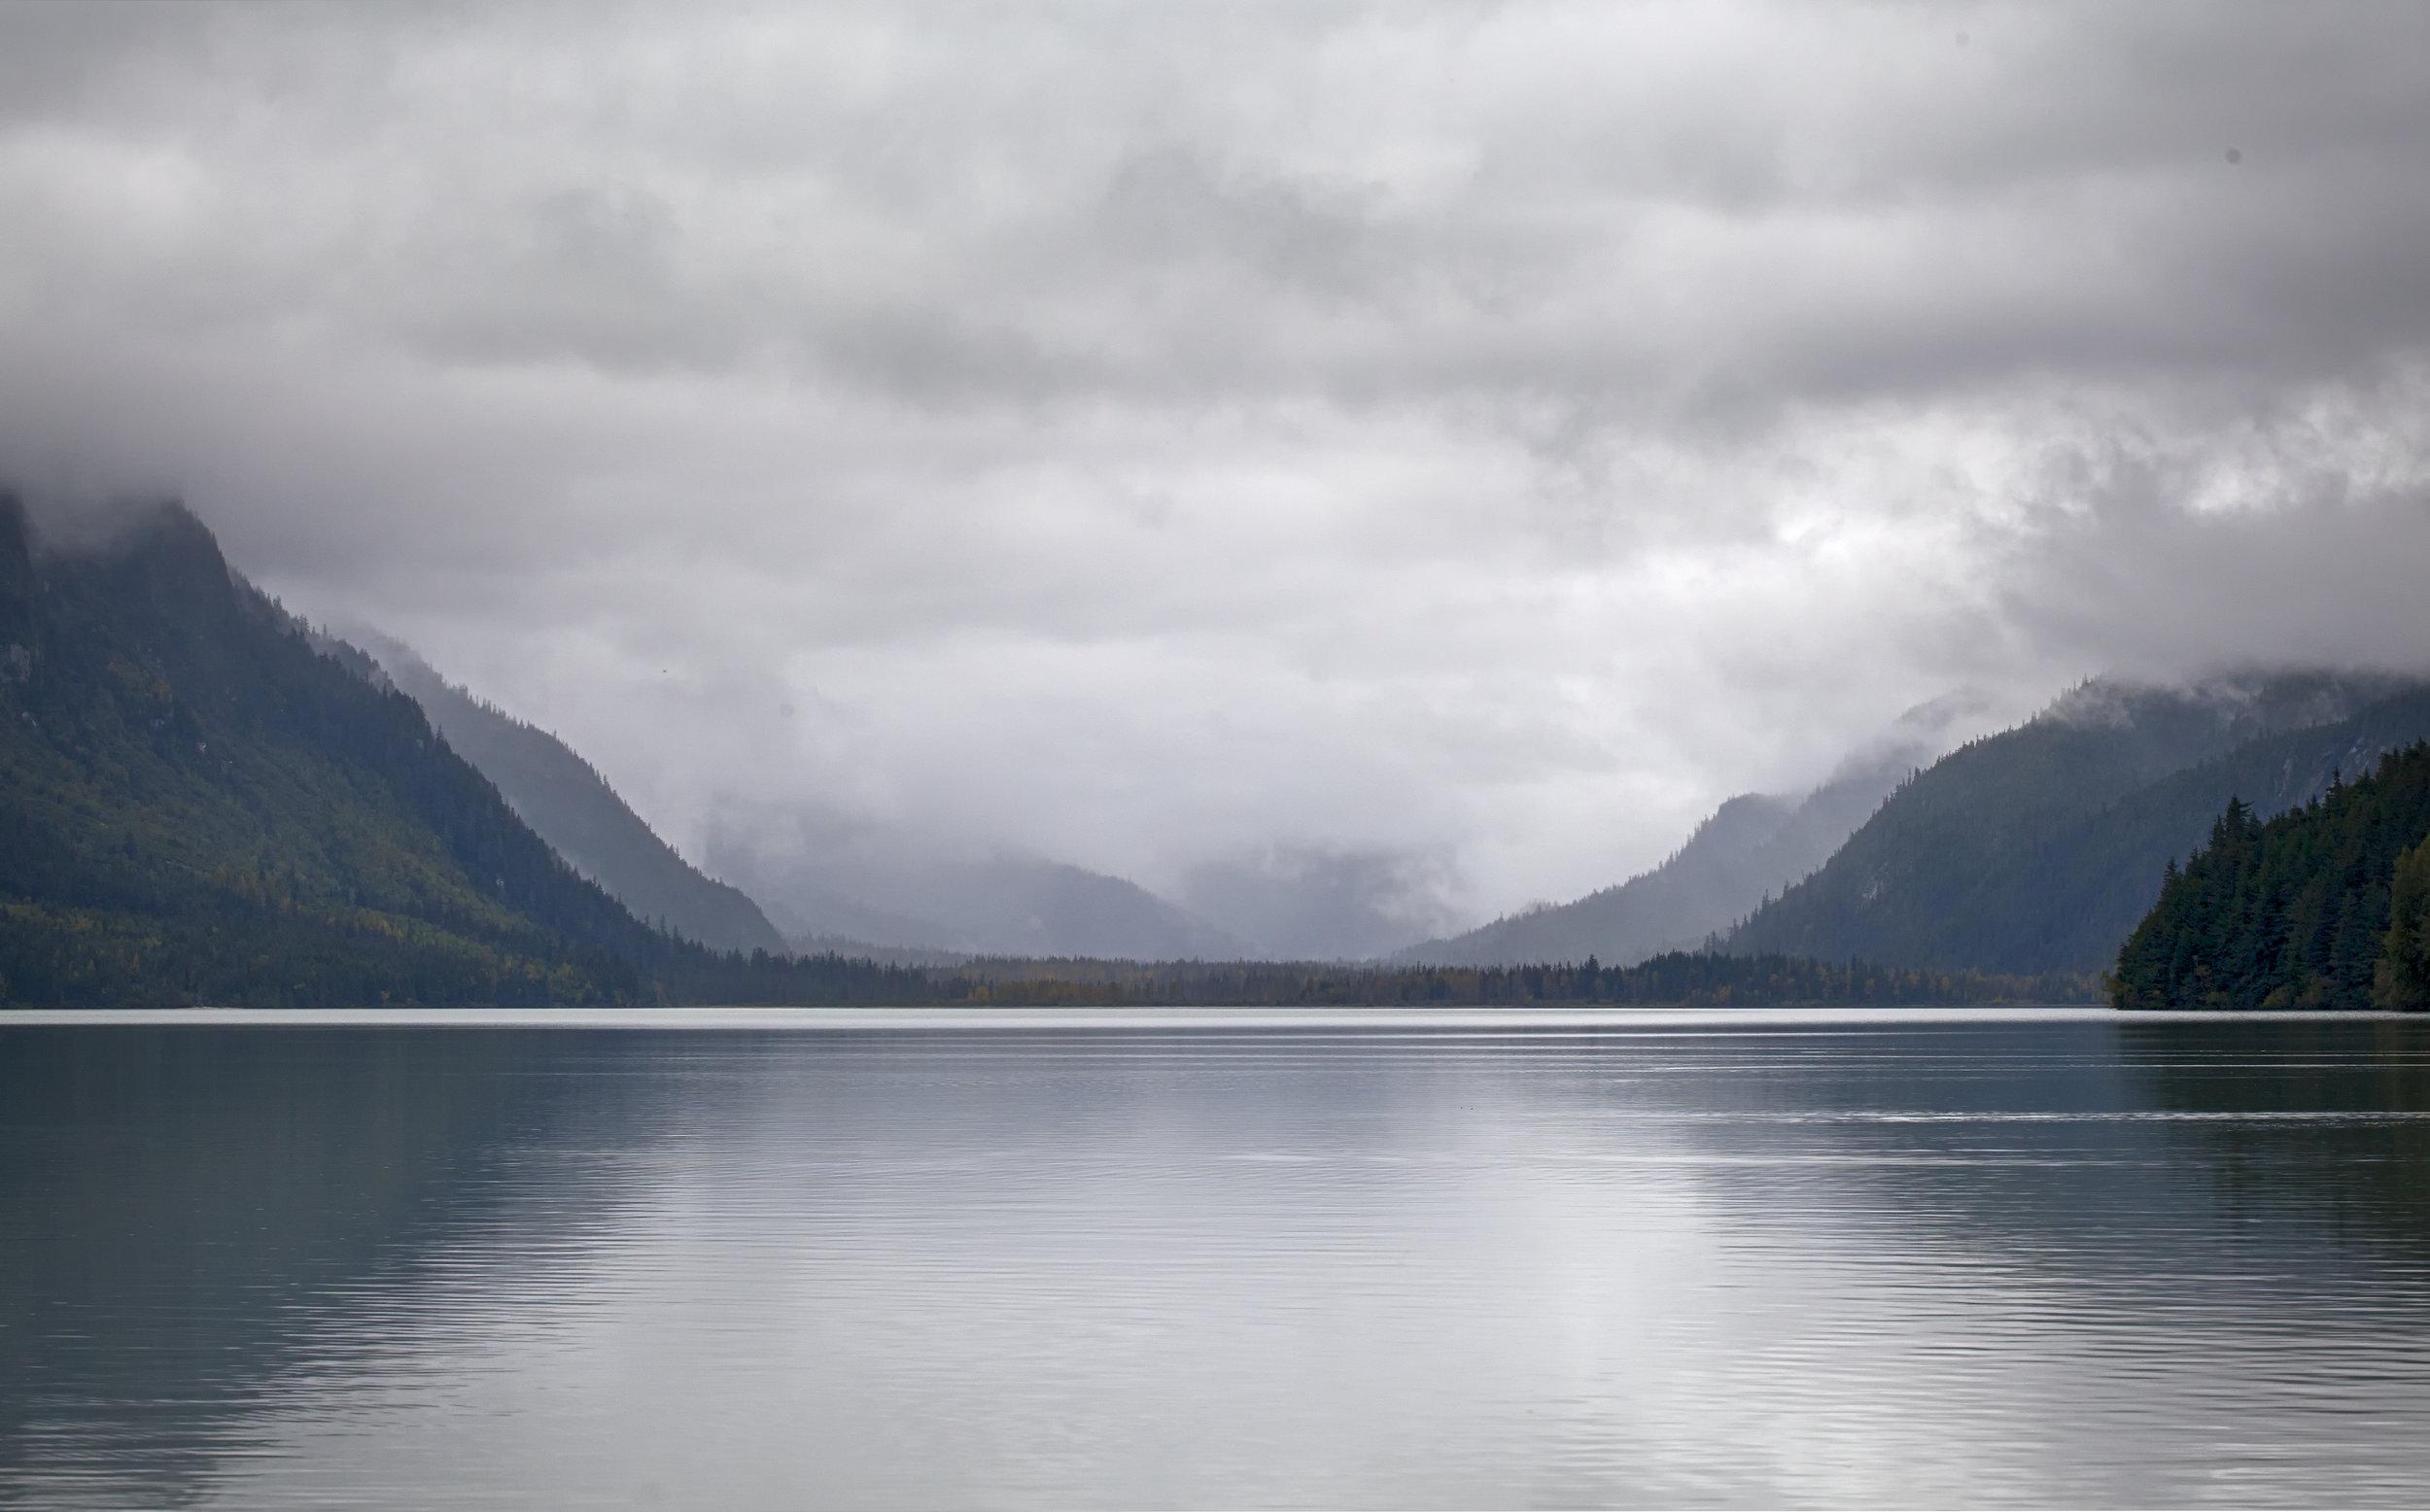 Haines, Alaska - Across the Blue Planet